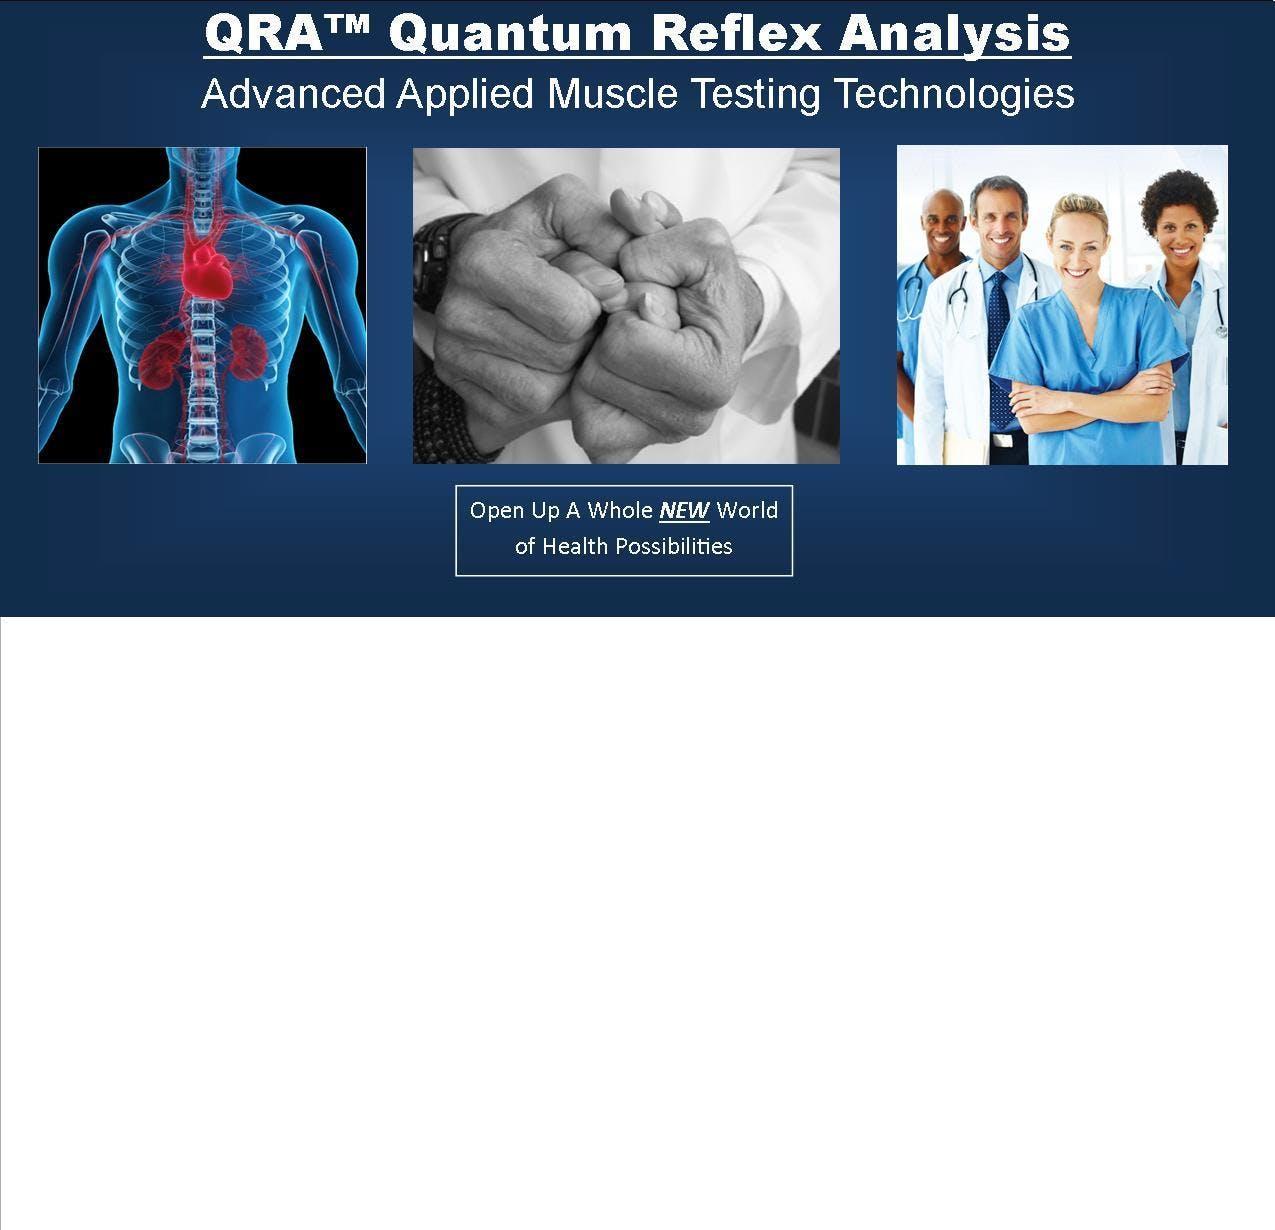 QRA™ Quantum Reflex Analysis Workshop #4 - Qu